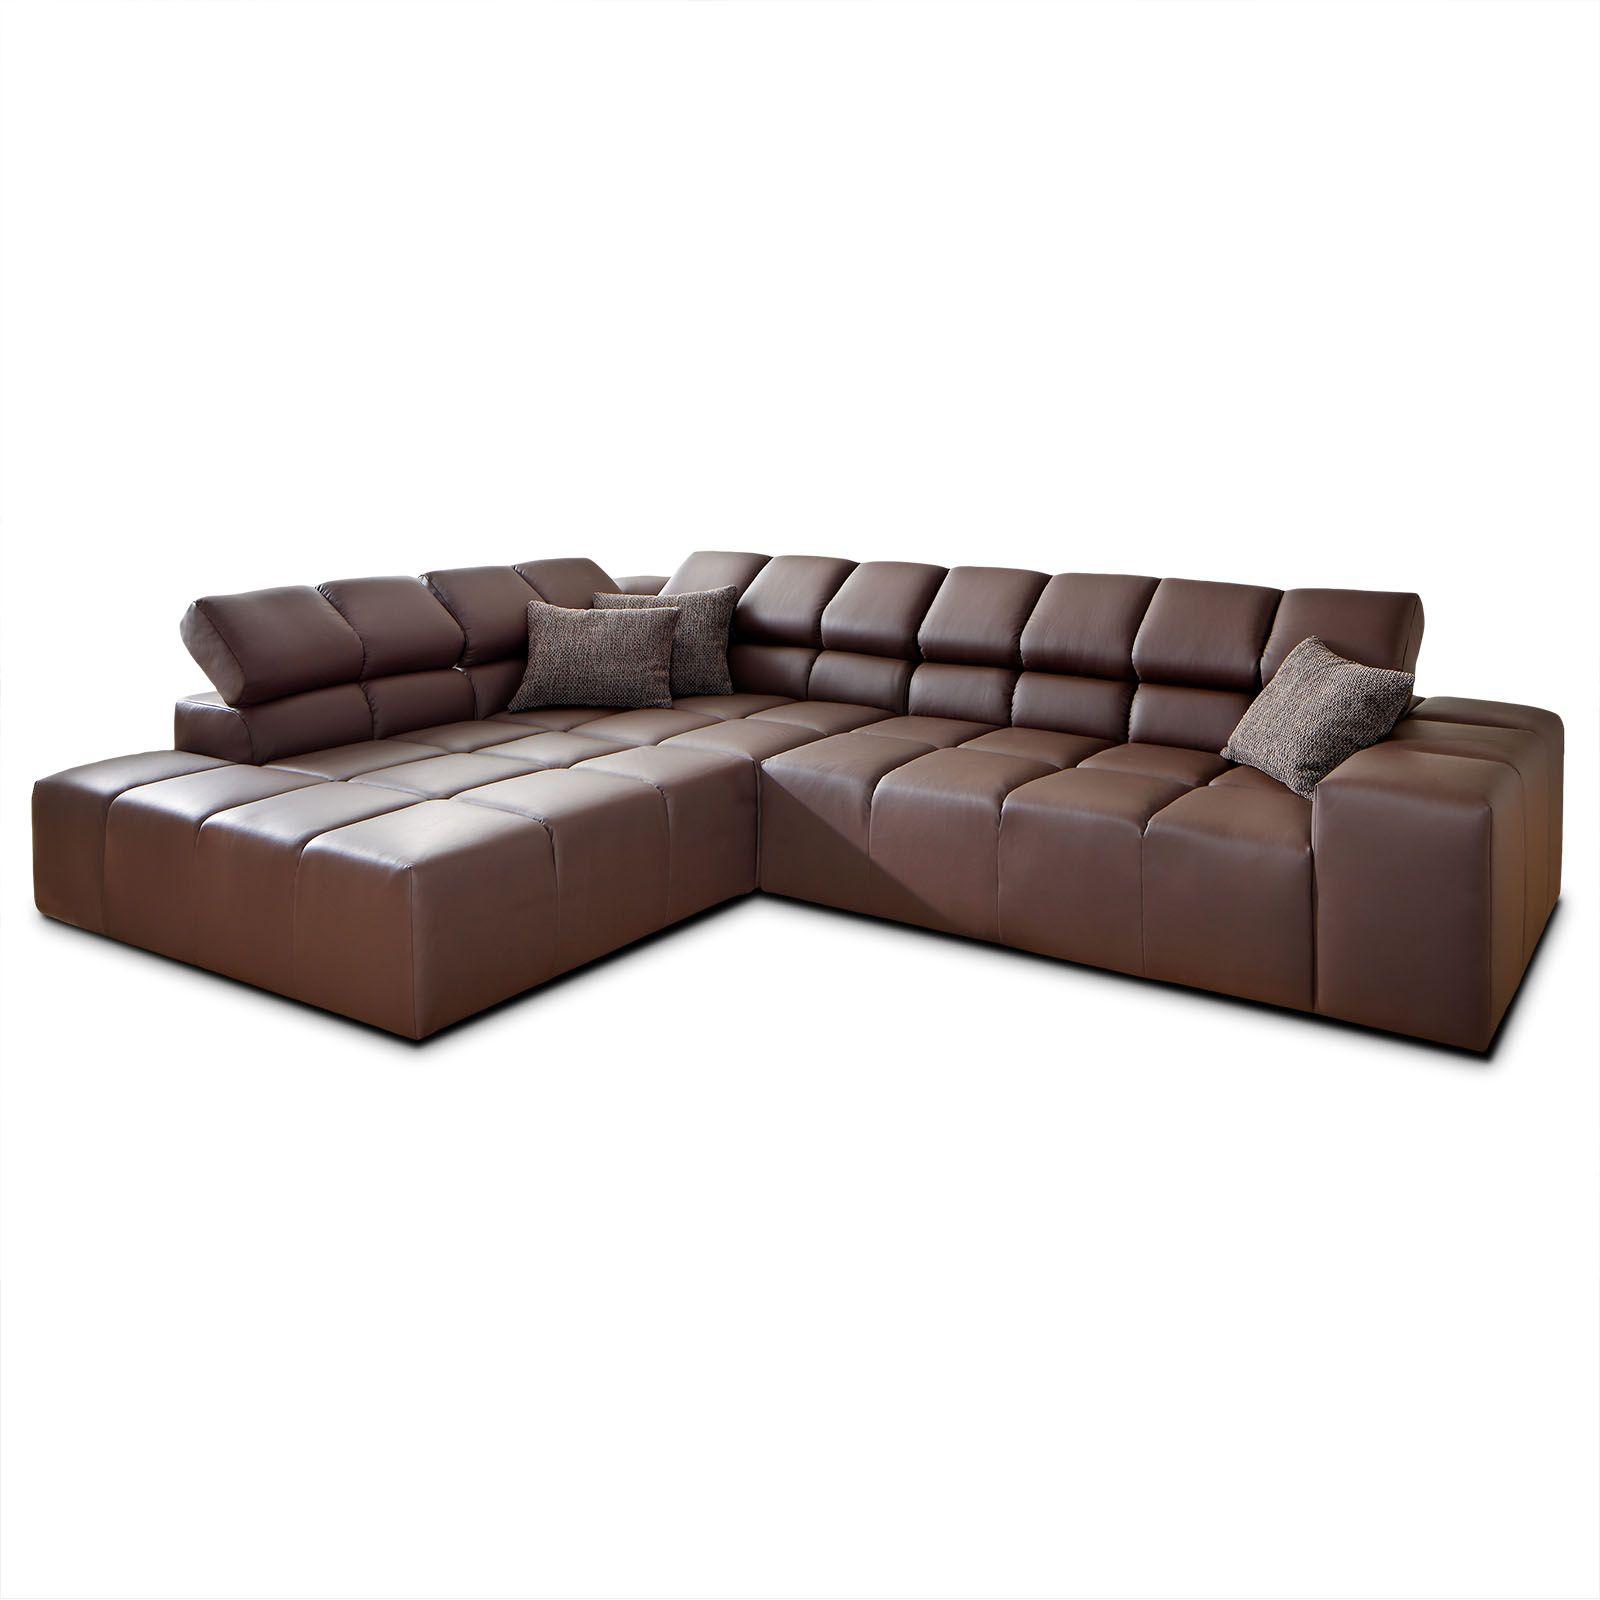 billig echtleder ecksofa wohnen ecksofa sofa et. Black Bedroom Furniture Sets. Home Design Ideas